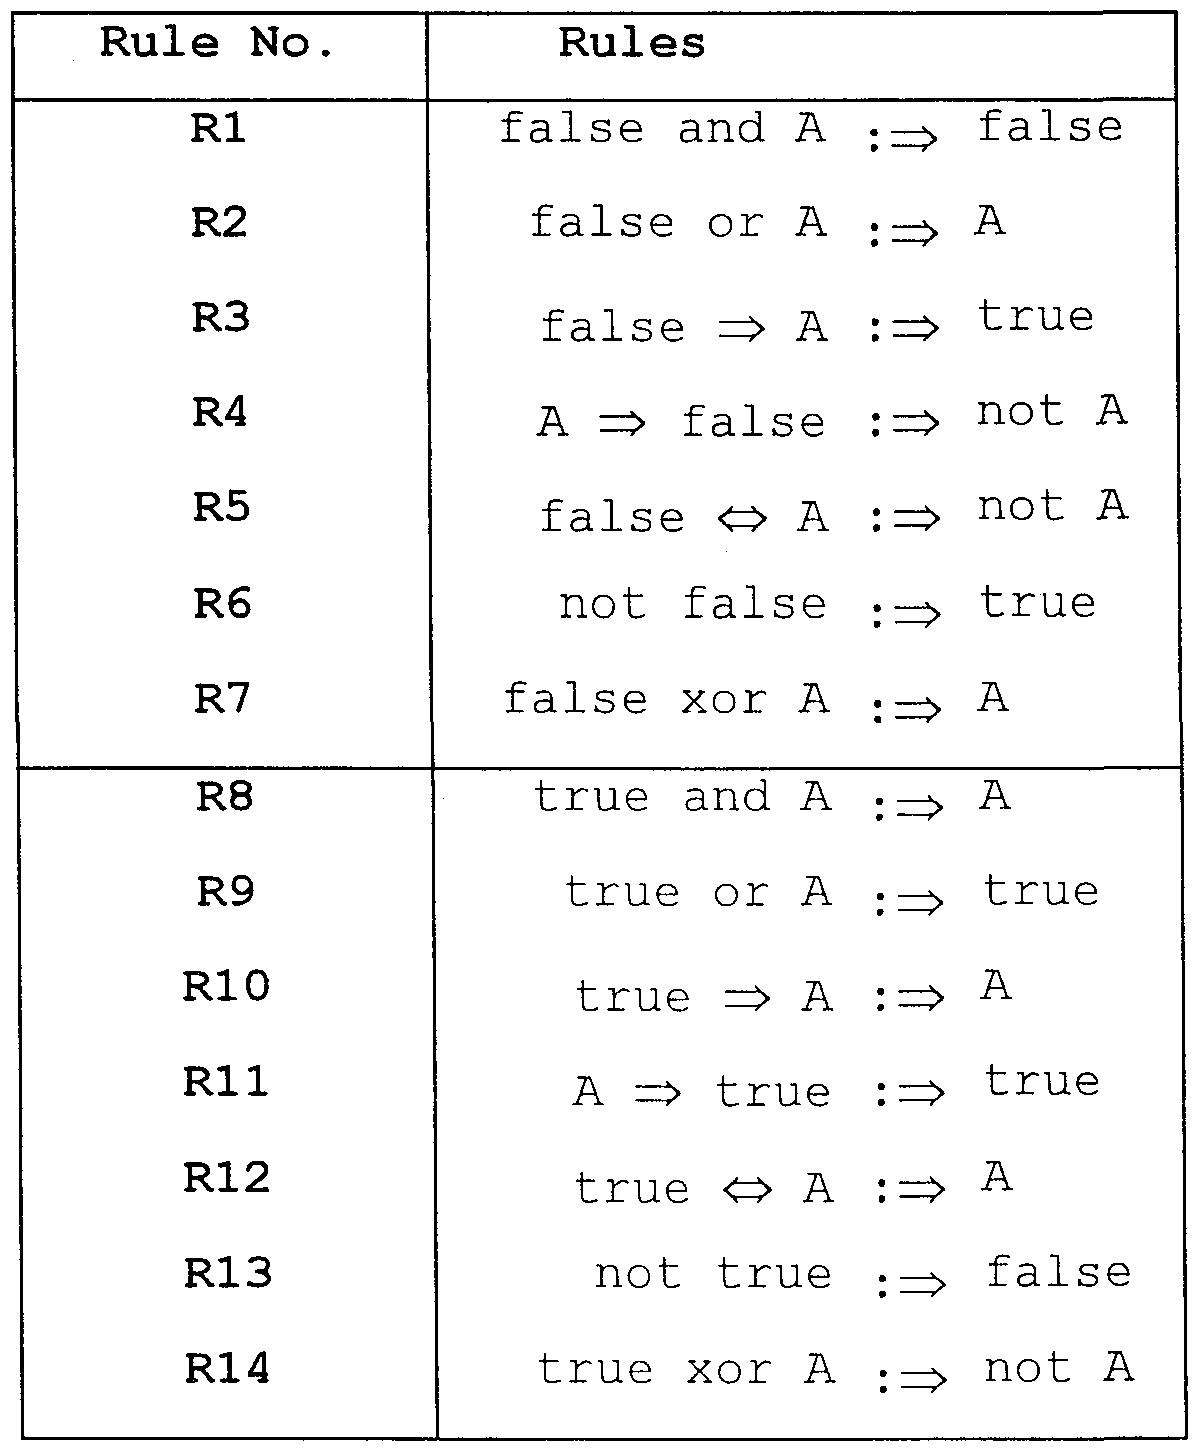 Logic symbols chart gallery symbol and sign ideas algebra symbols chart images algebra symbols chart algebra symbols chart figure algebra symbols chart figure source biocorpaavc